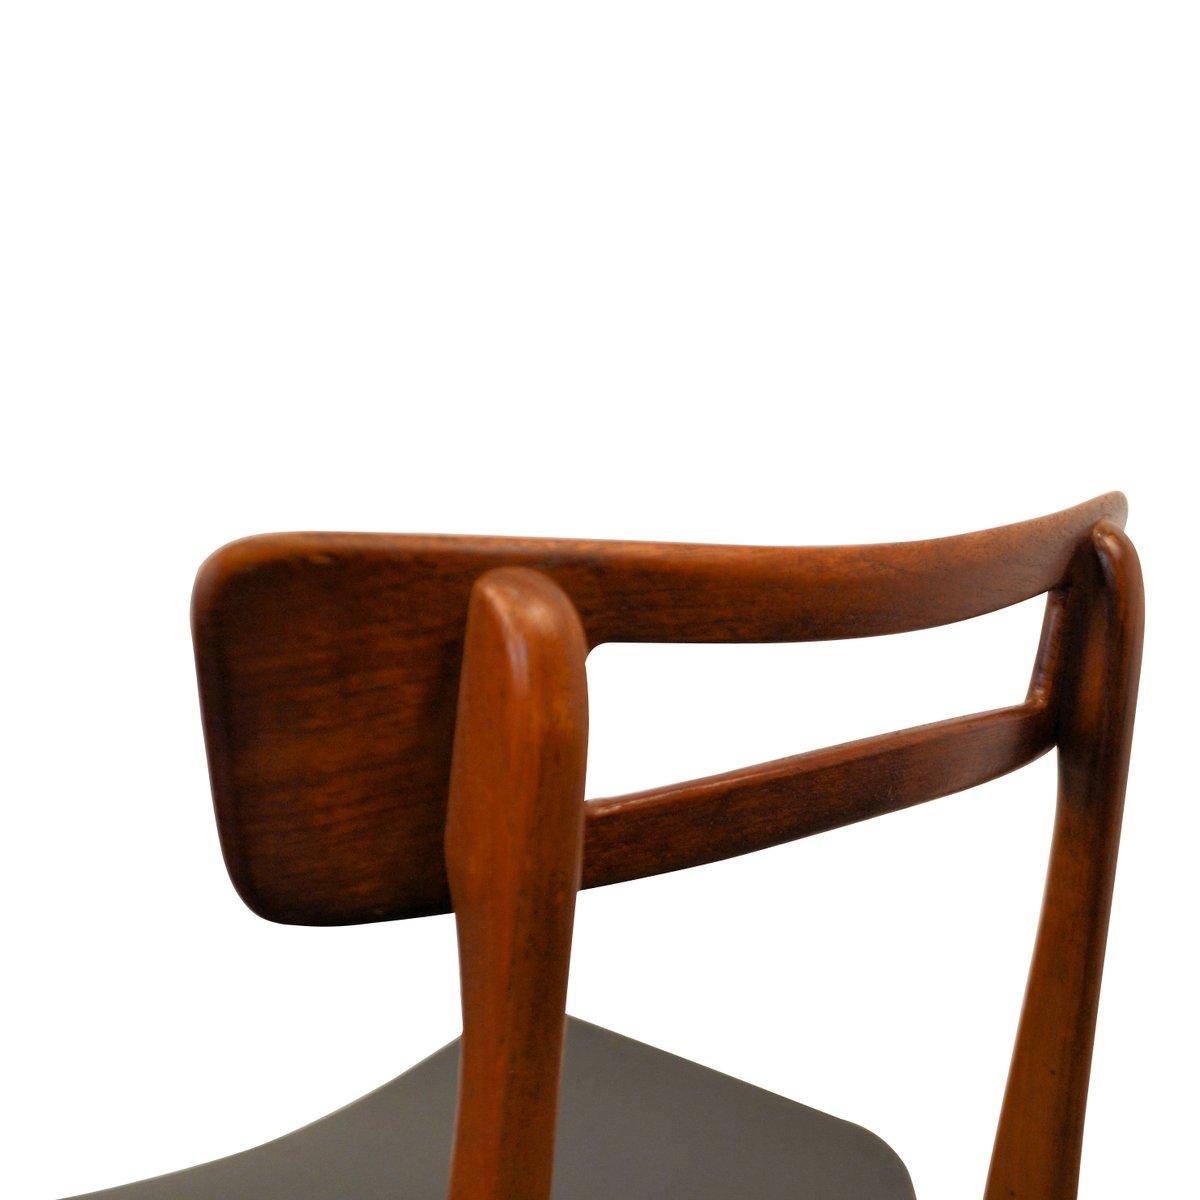 Danish Teak Dining Chairs 1950s Set of 6 for sale at Pamono : danish teak dining chairs 1950s set of 6 12 from www.pamono.co.uk size 1200 x 1200 jpeg 47kB